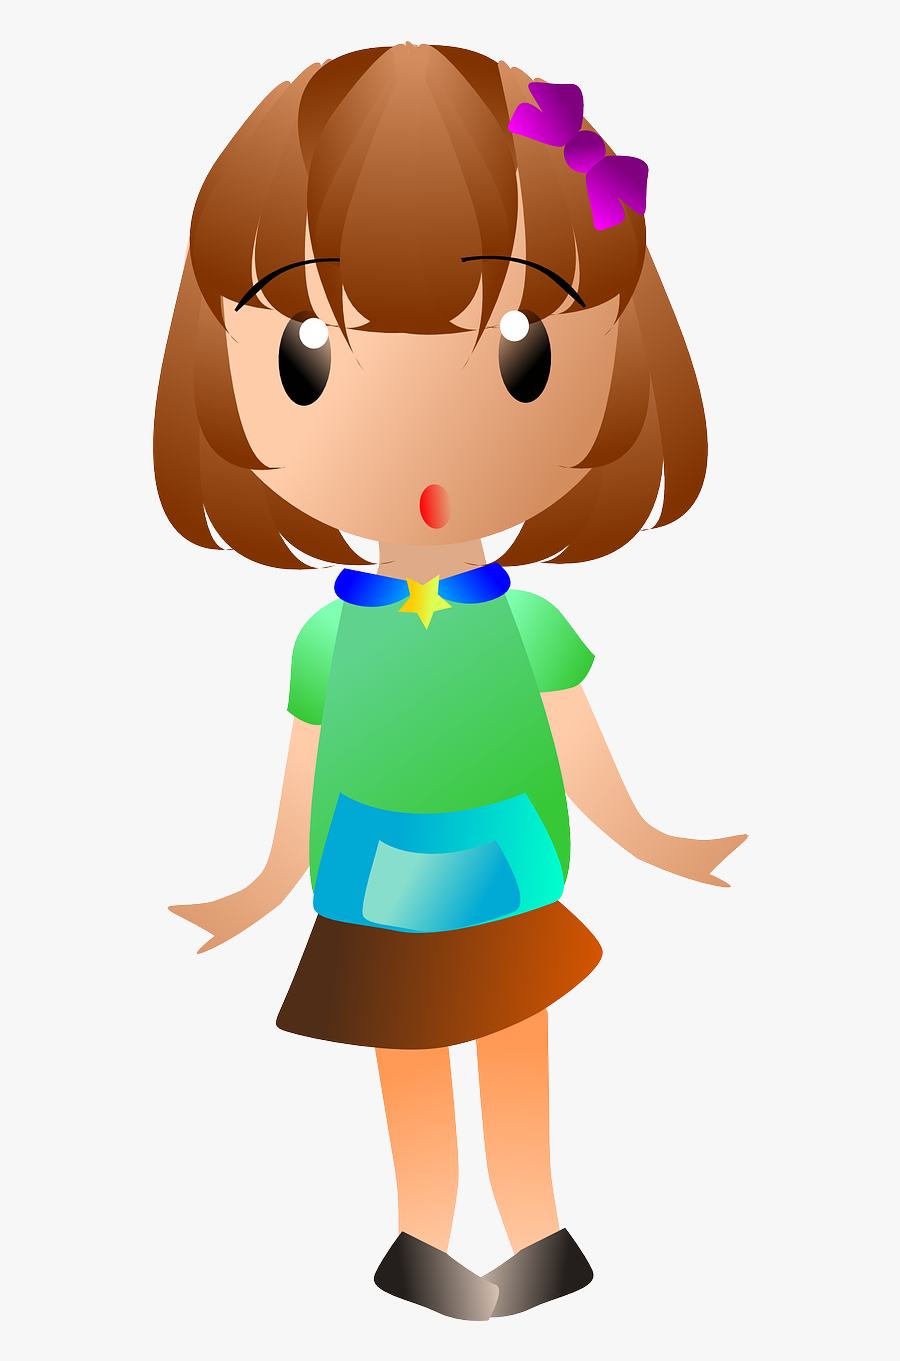 Girl Cute Embarrassed Free Picture - Kız Çocuk Resmi Çizim, Transparent Clipart